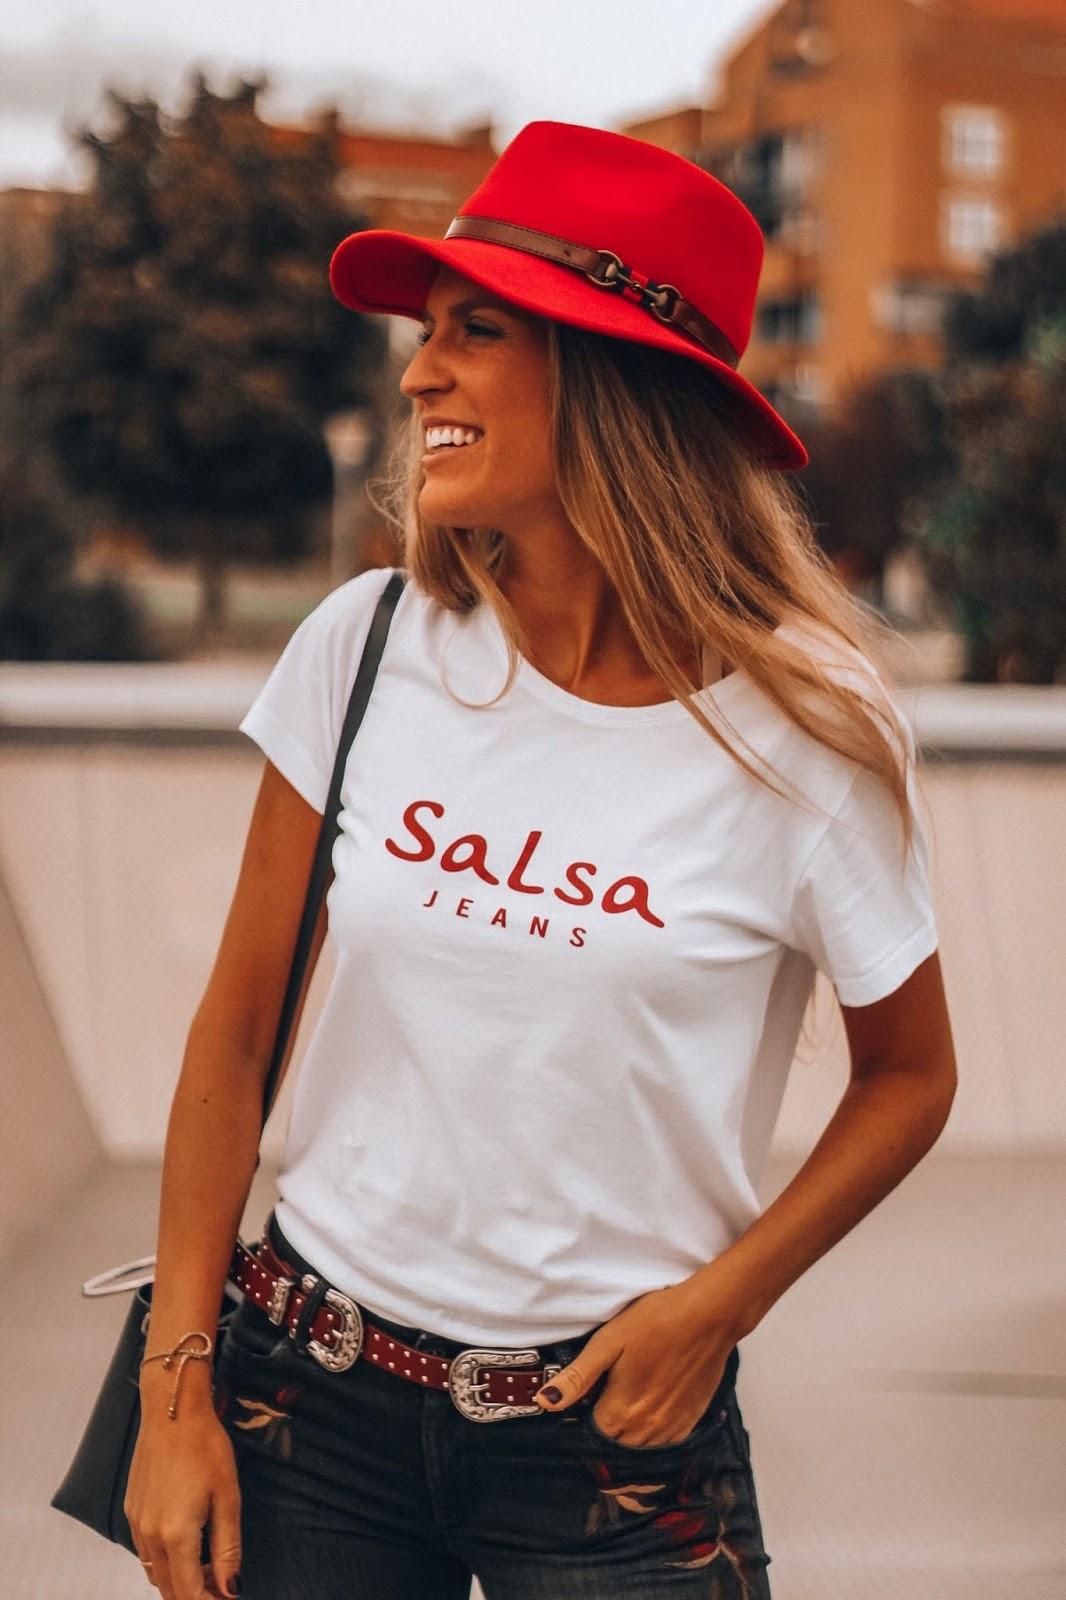 camiseta salsa jeans